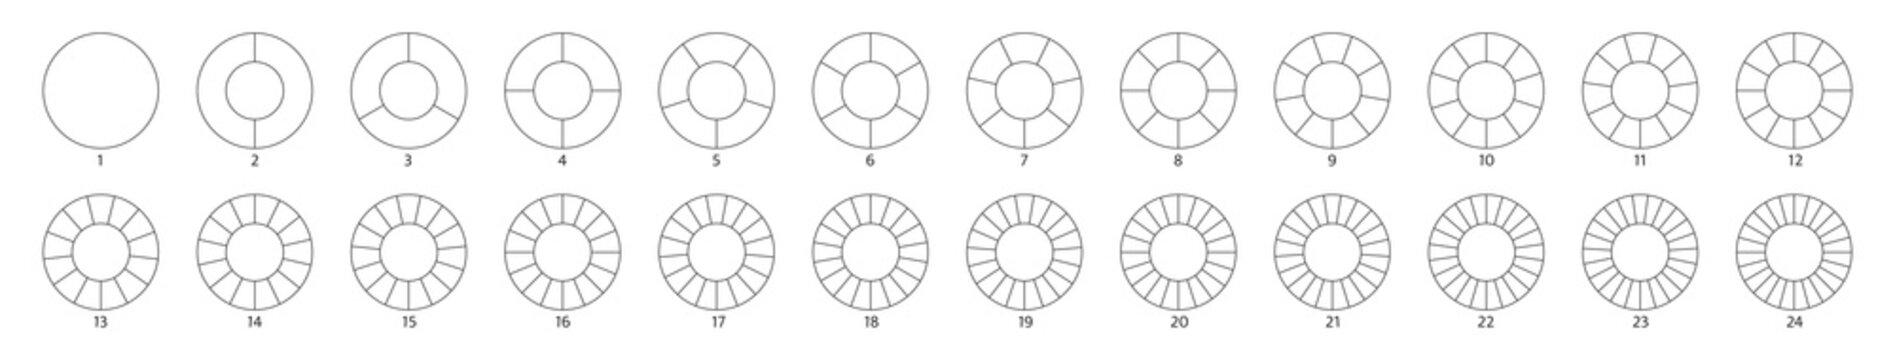 Wheel round diagram part big set. Segment slice sign. Circle section graph line art. Pie chart icon. 2,3,4,5,6 segment infographic. Five phase, six circular cycle. Geometric element. Vector